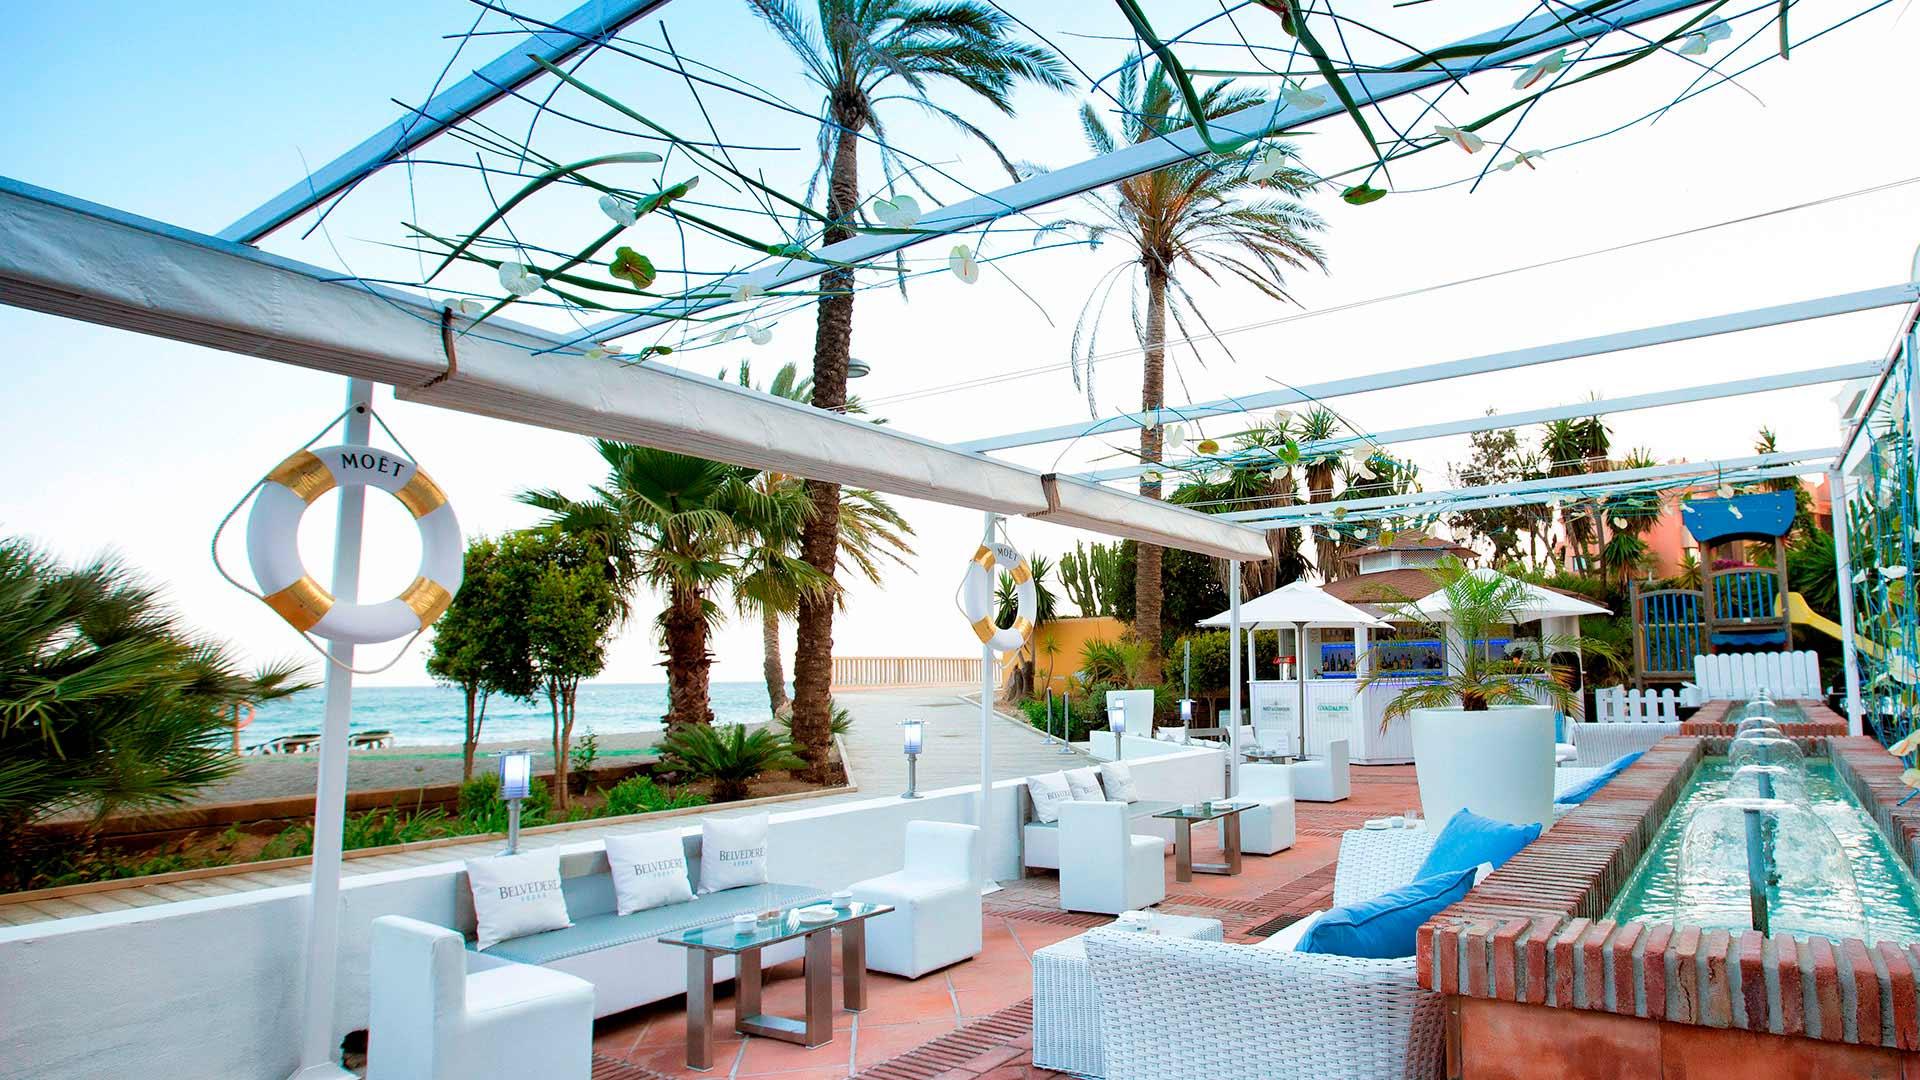 Moët & Chandon Beach Lounge